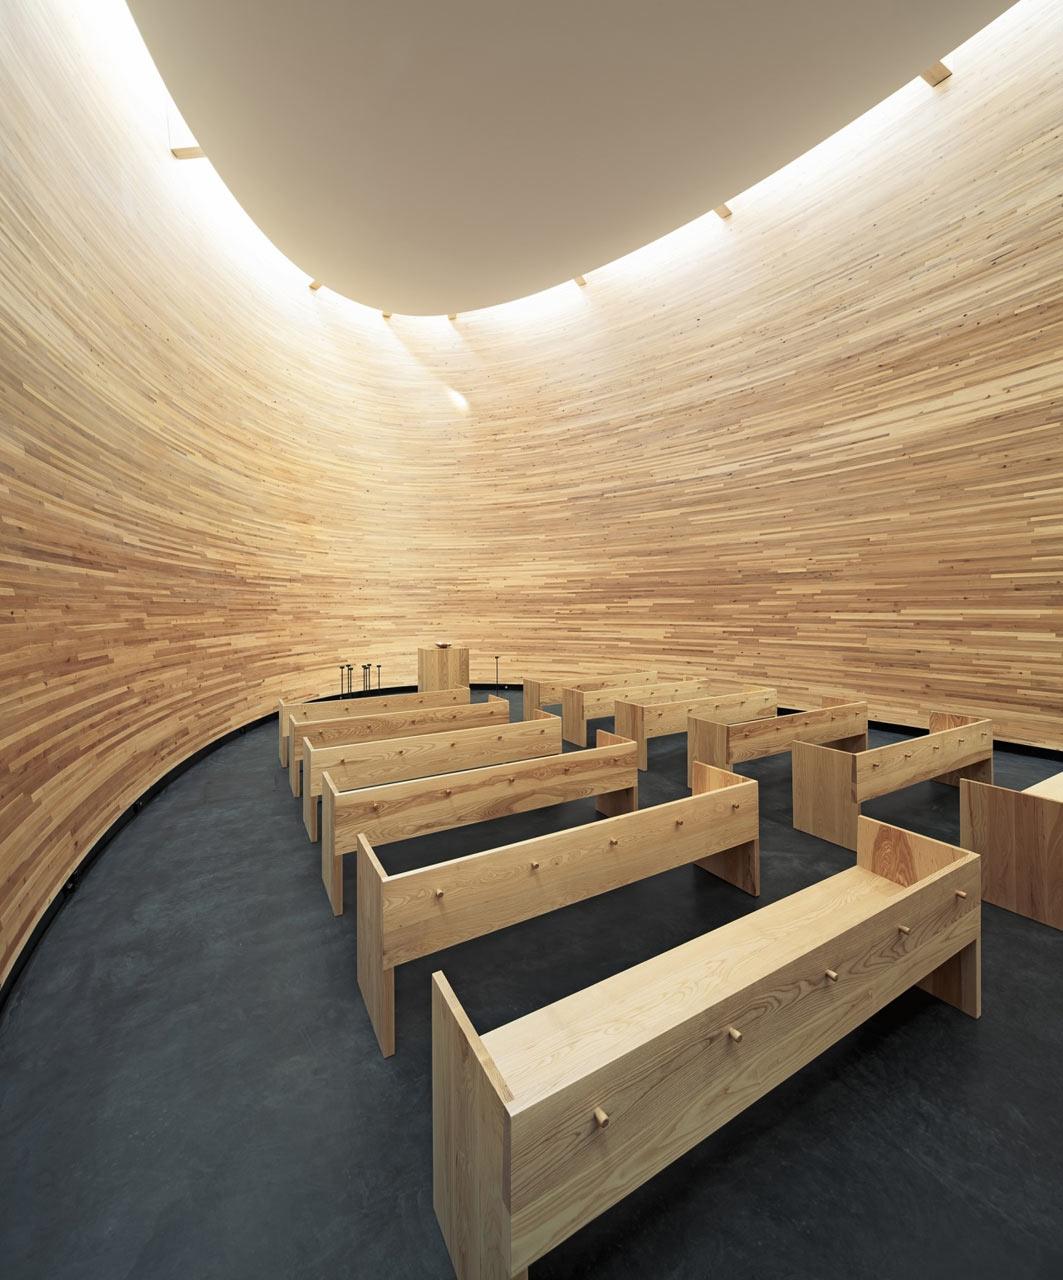 roundup-religious-5-kamppi-chapel-k2s-architects